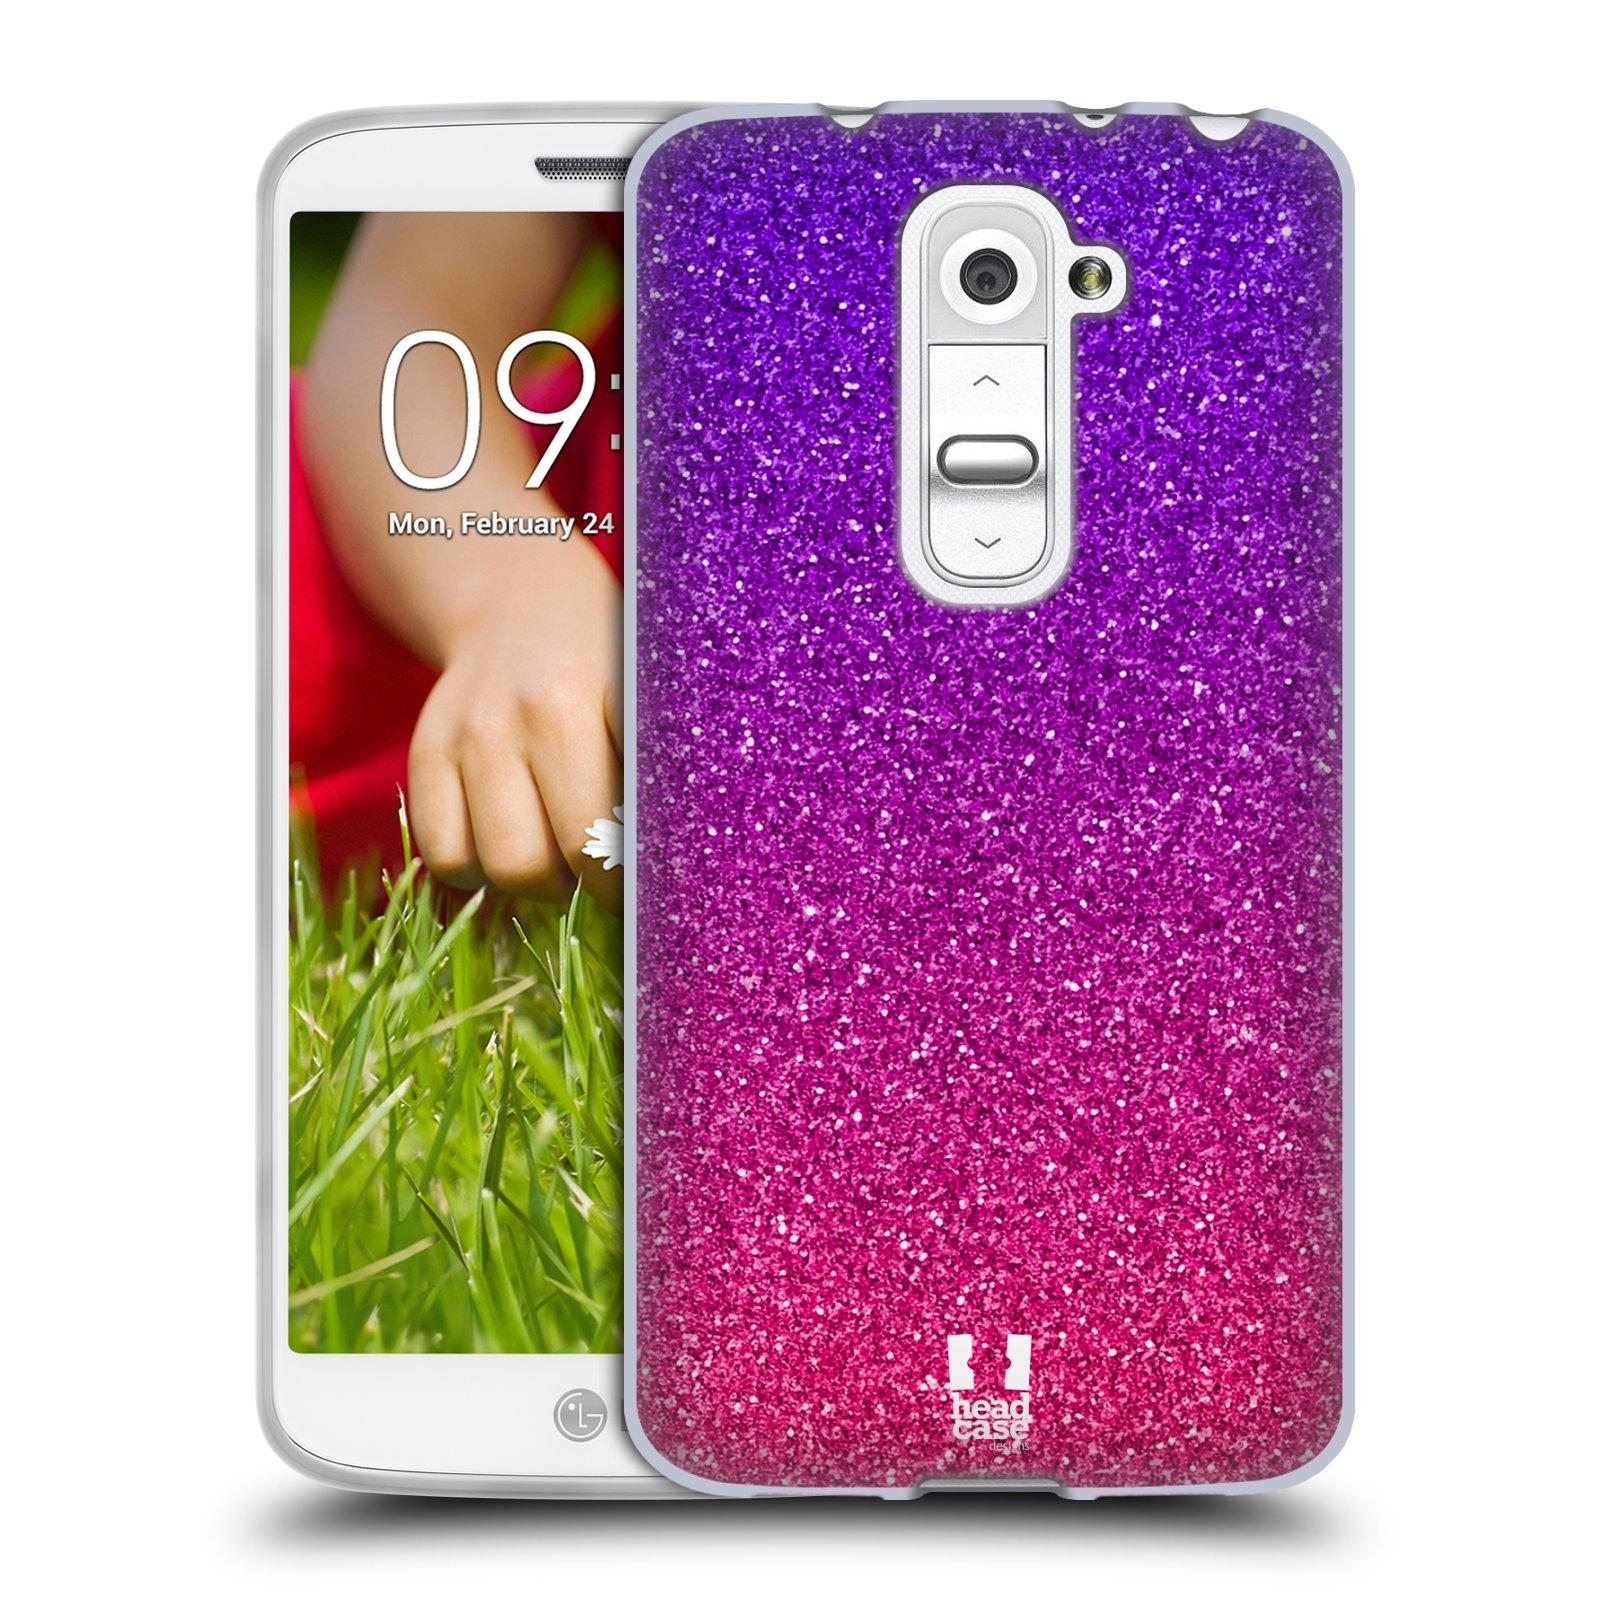 Silikonové pouzdro na mobil LG G2 Mini HEAD CASE MIX PINK (Silikonový kryt či obal na mobilní telefon LG G2 Mini D620)